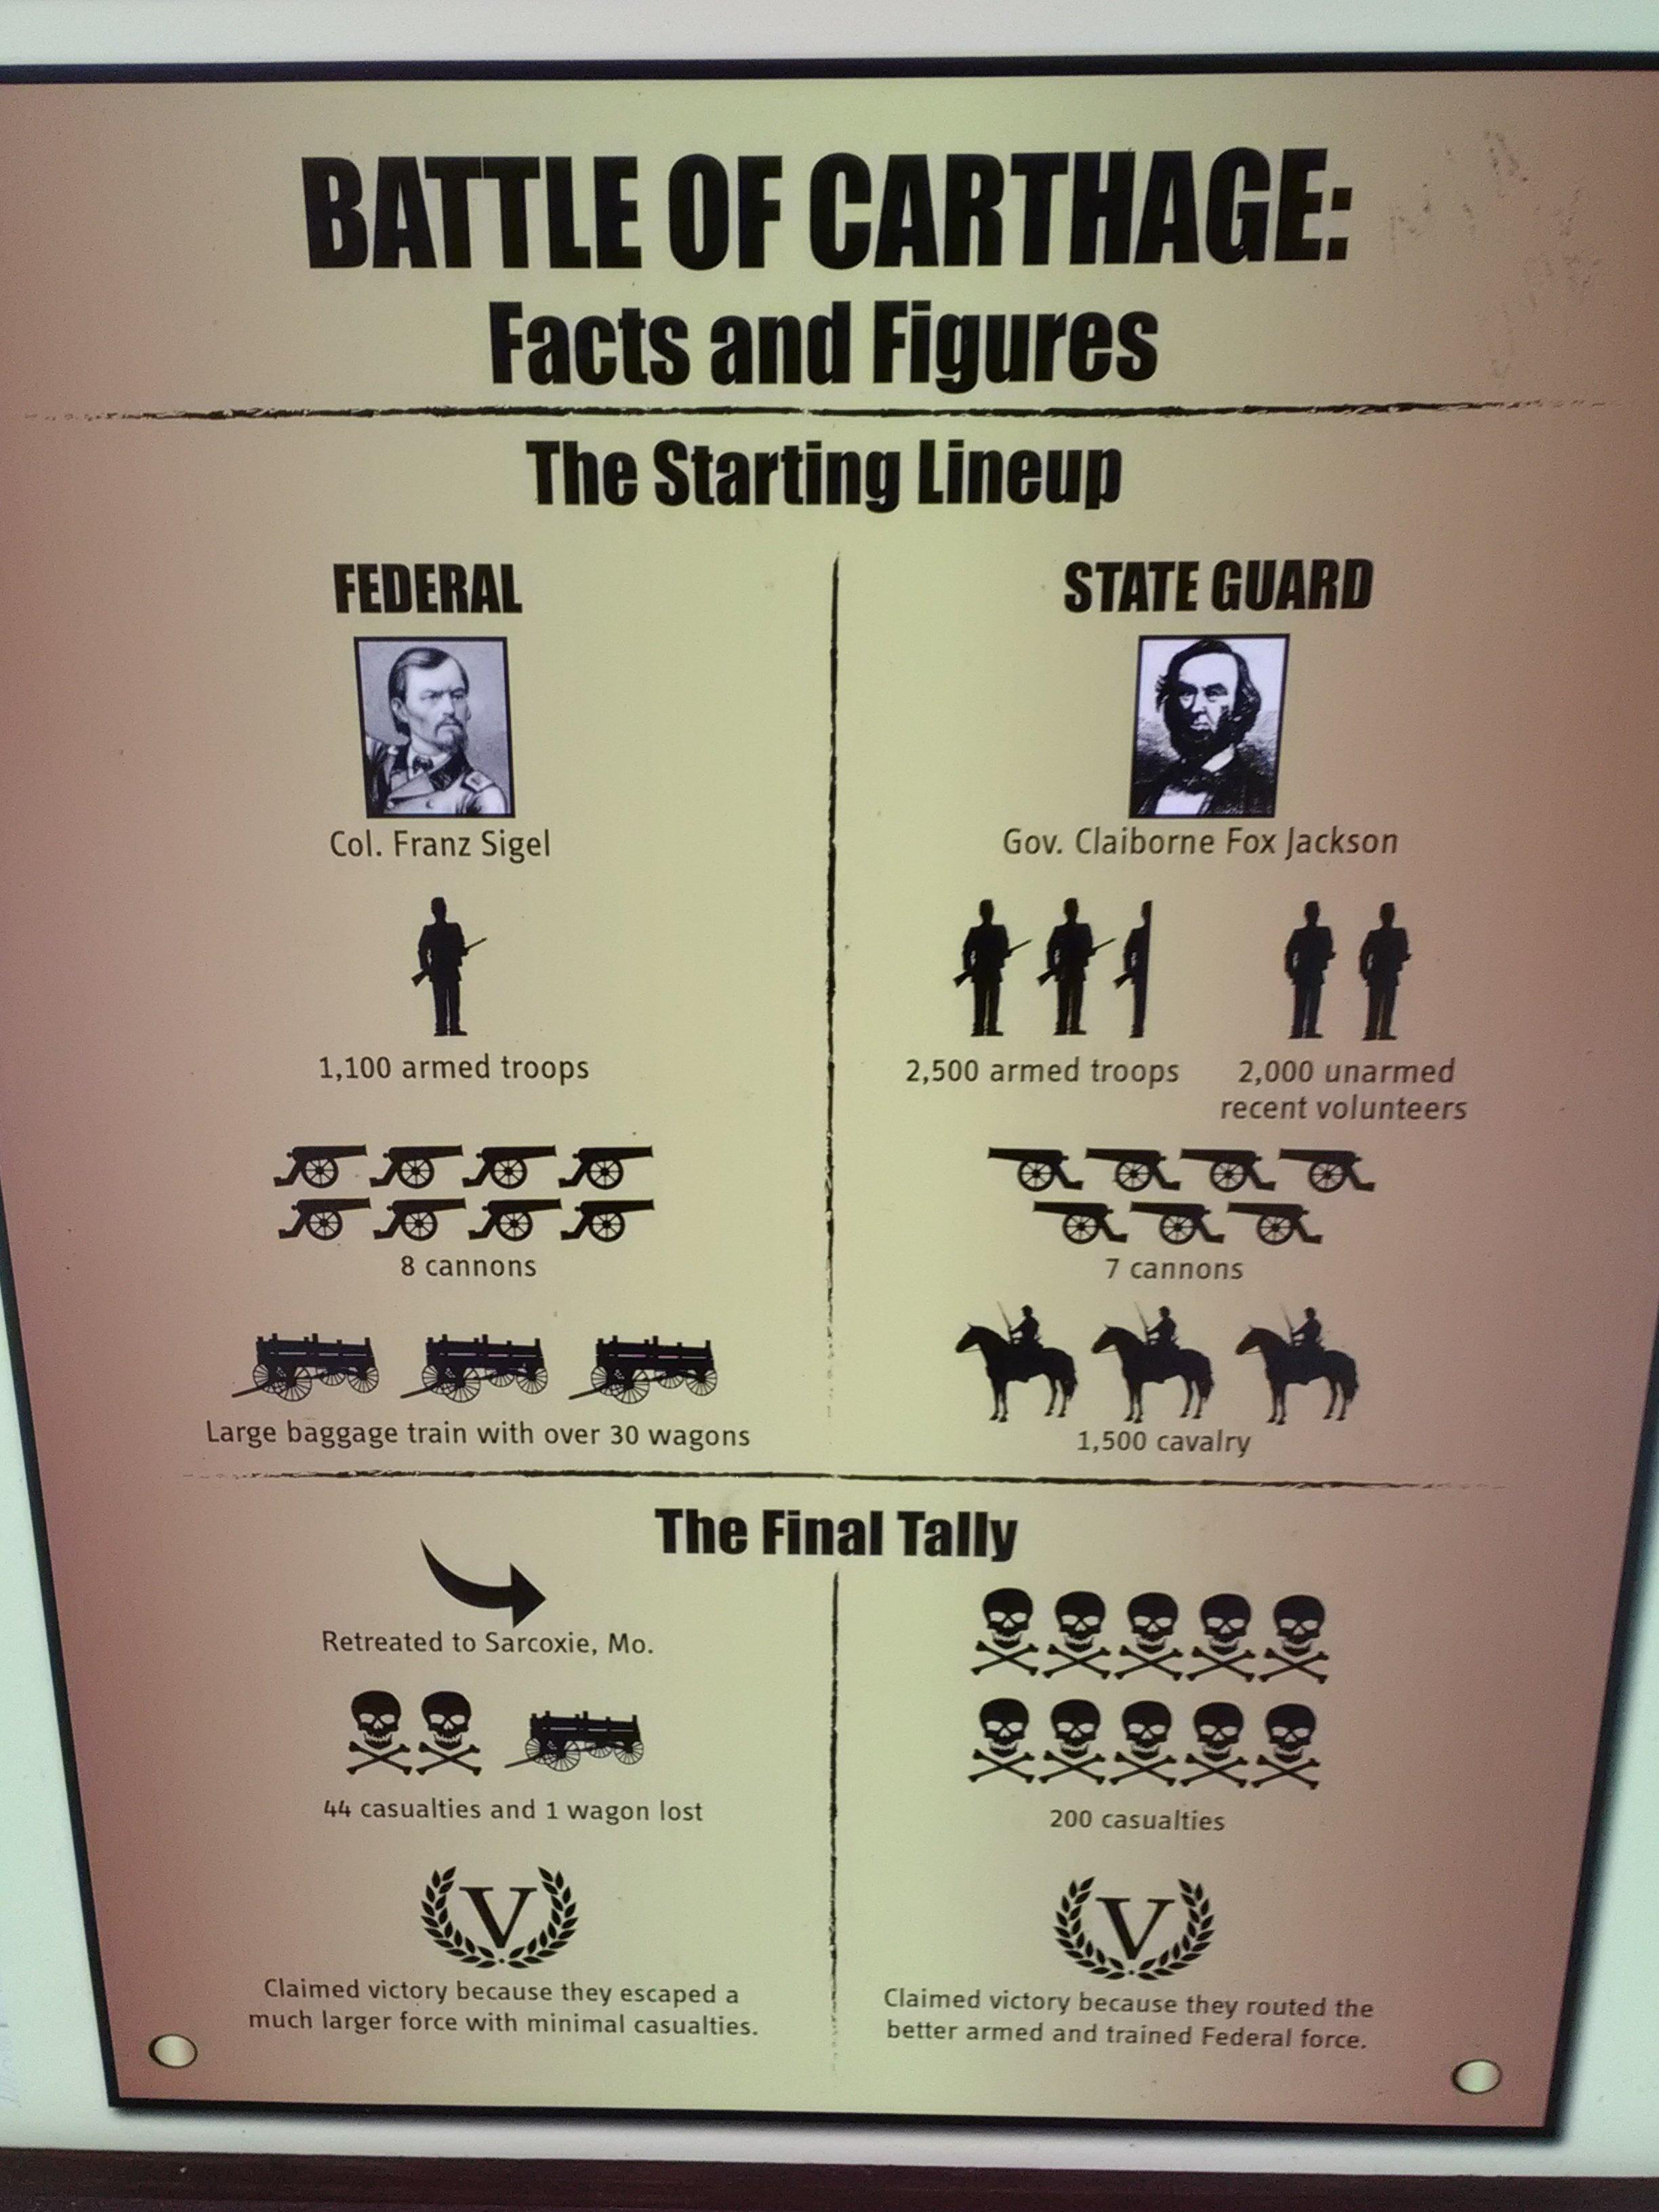 Signage from Battle of Carthage kiosk.